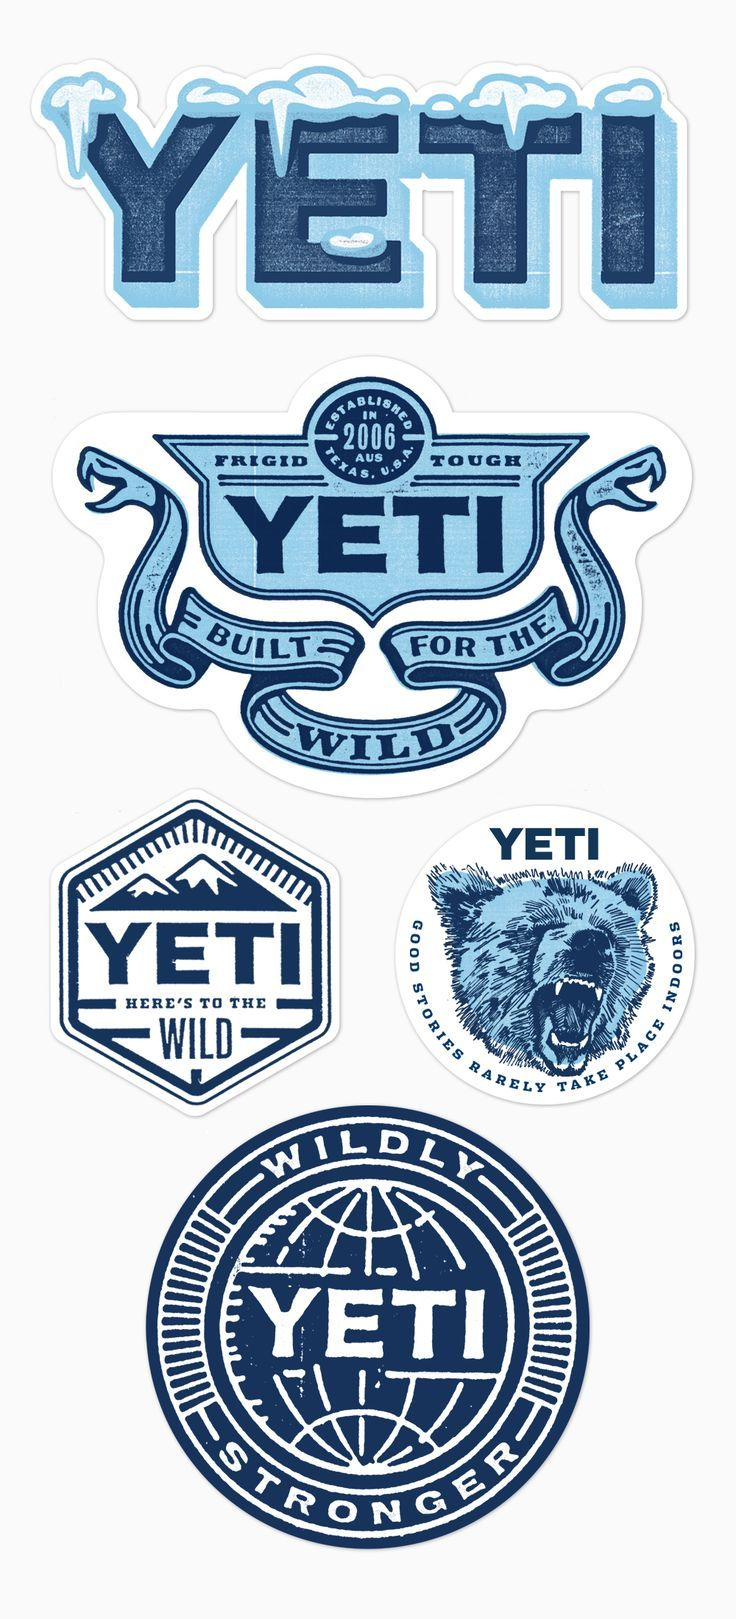 Yeti Stickers1 Png Brand Stickers Sticker Design Graphic Design Logo